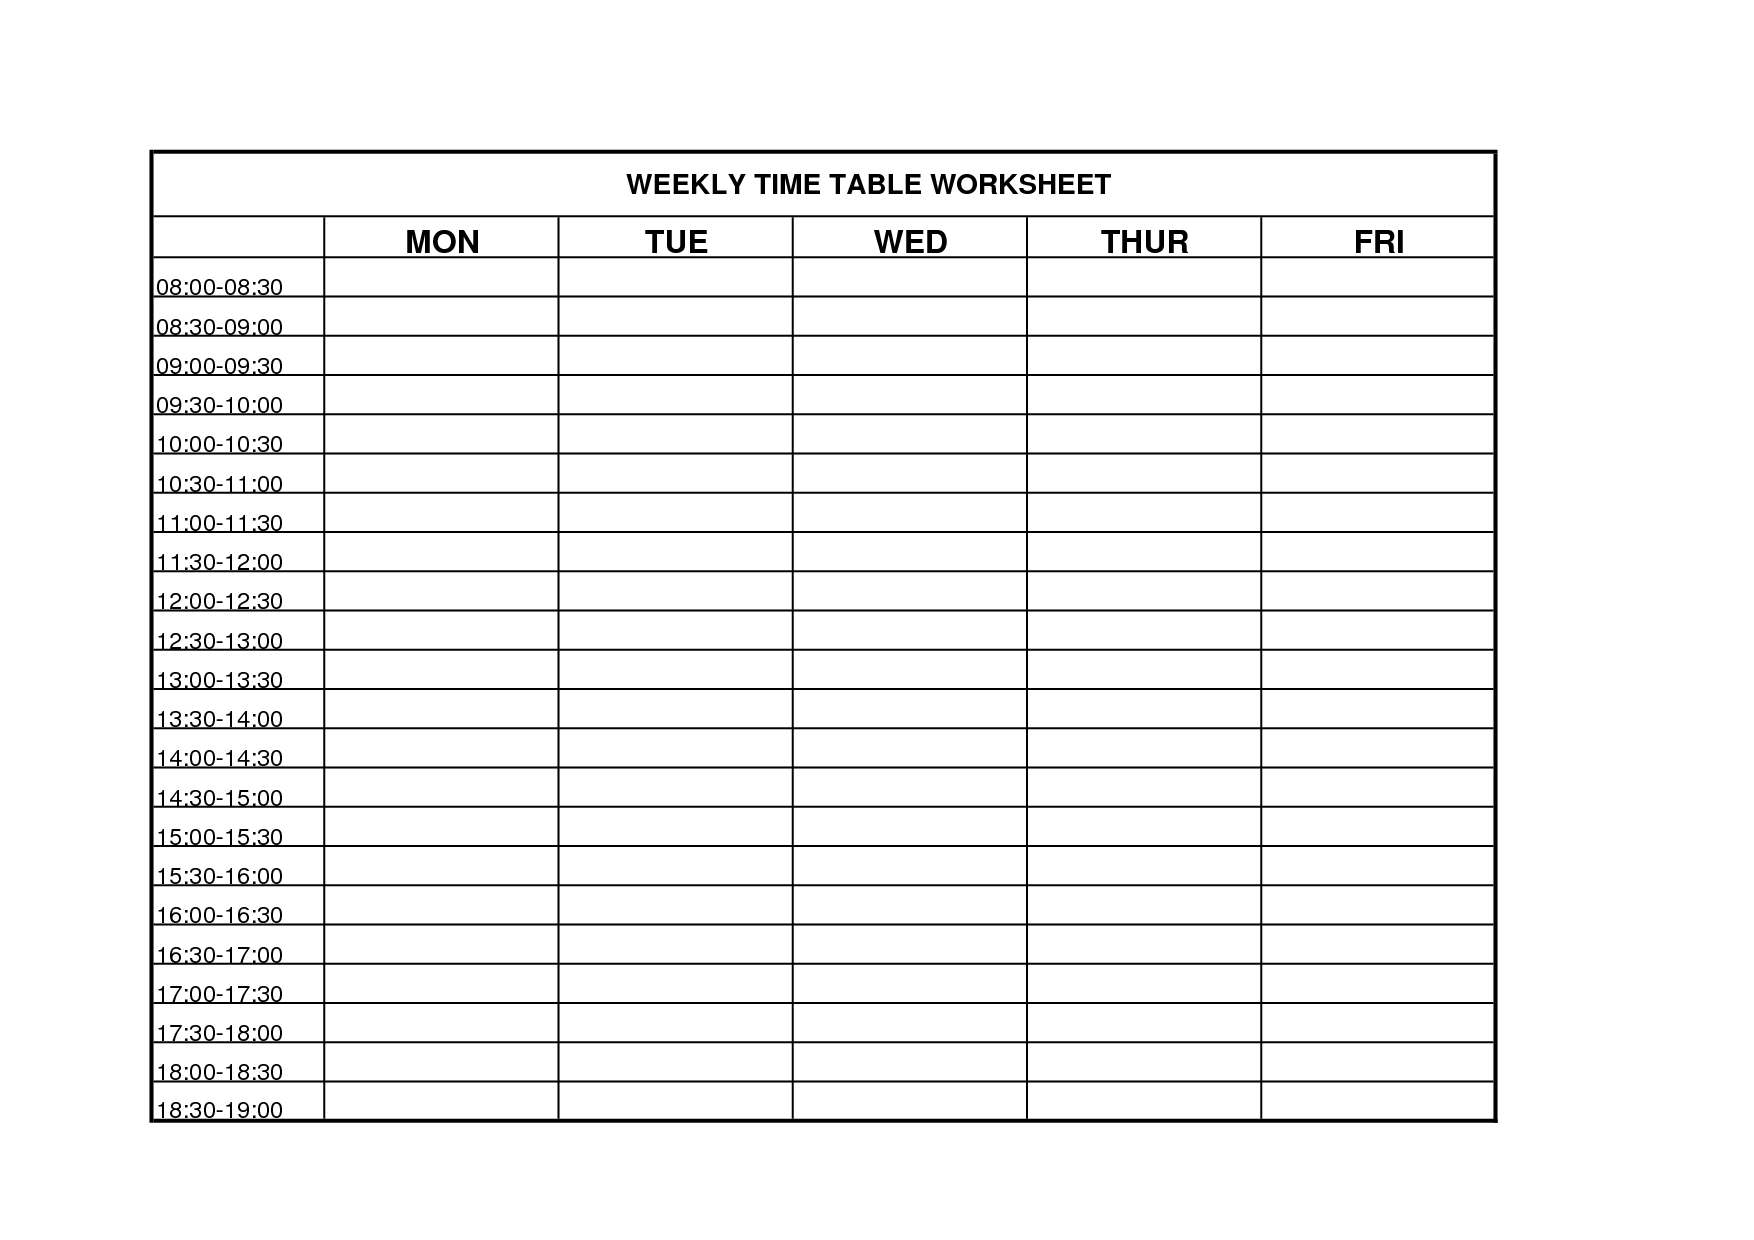 17 Best Images Of Worksheet Calendar Blank - Free Blank Calendar Worksheets, Printable Blank